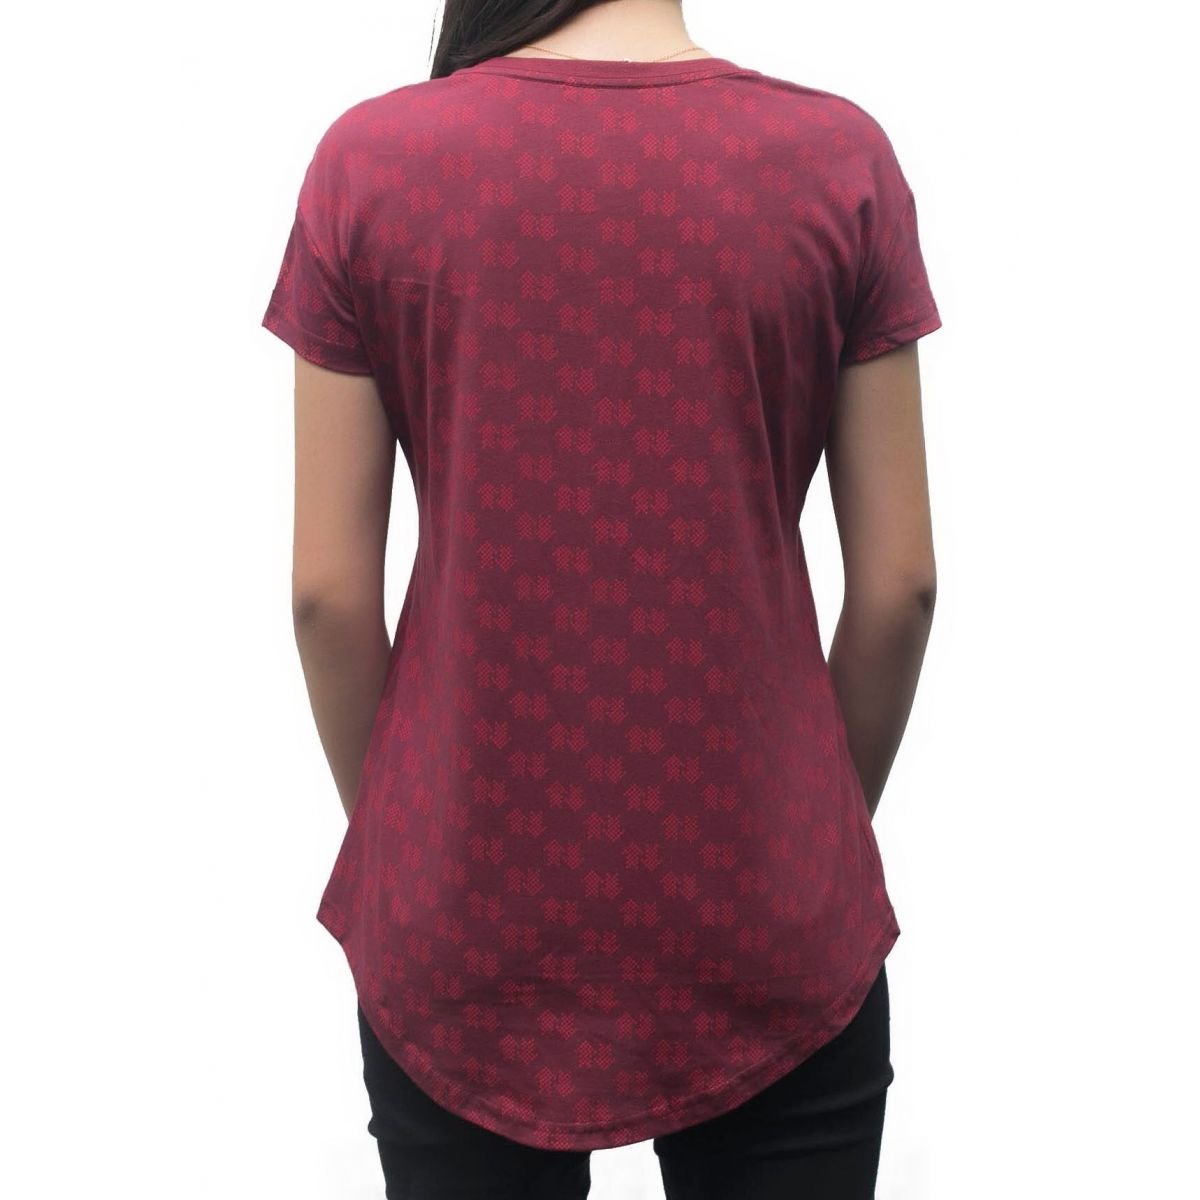 Camiseta  Upside Down Kingdom Feminina - #REINODEPONTACABEÇA  - Jesuscopy